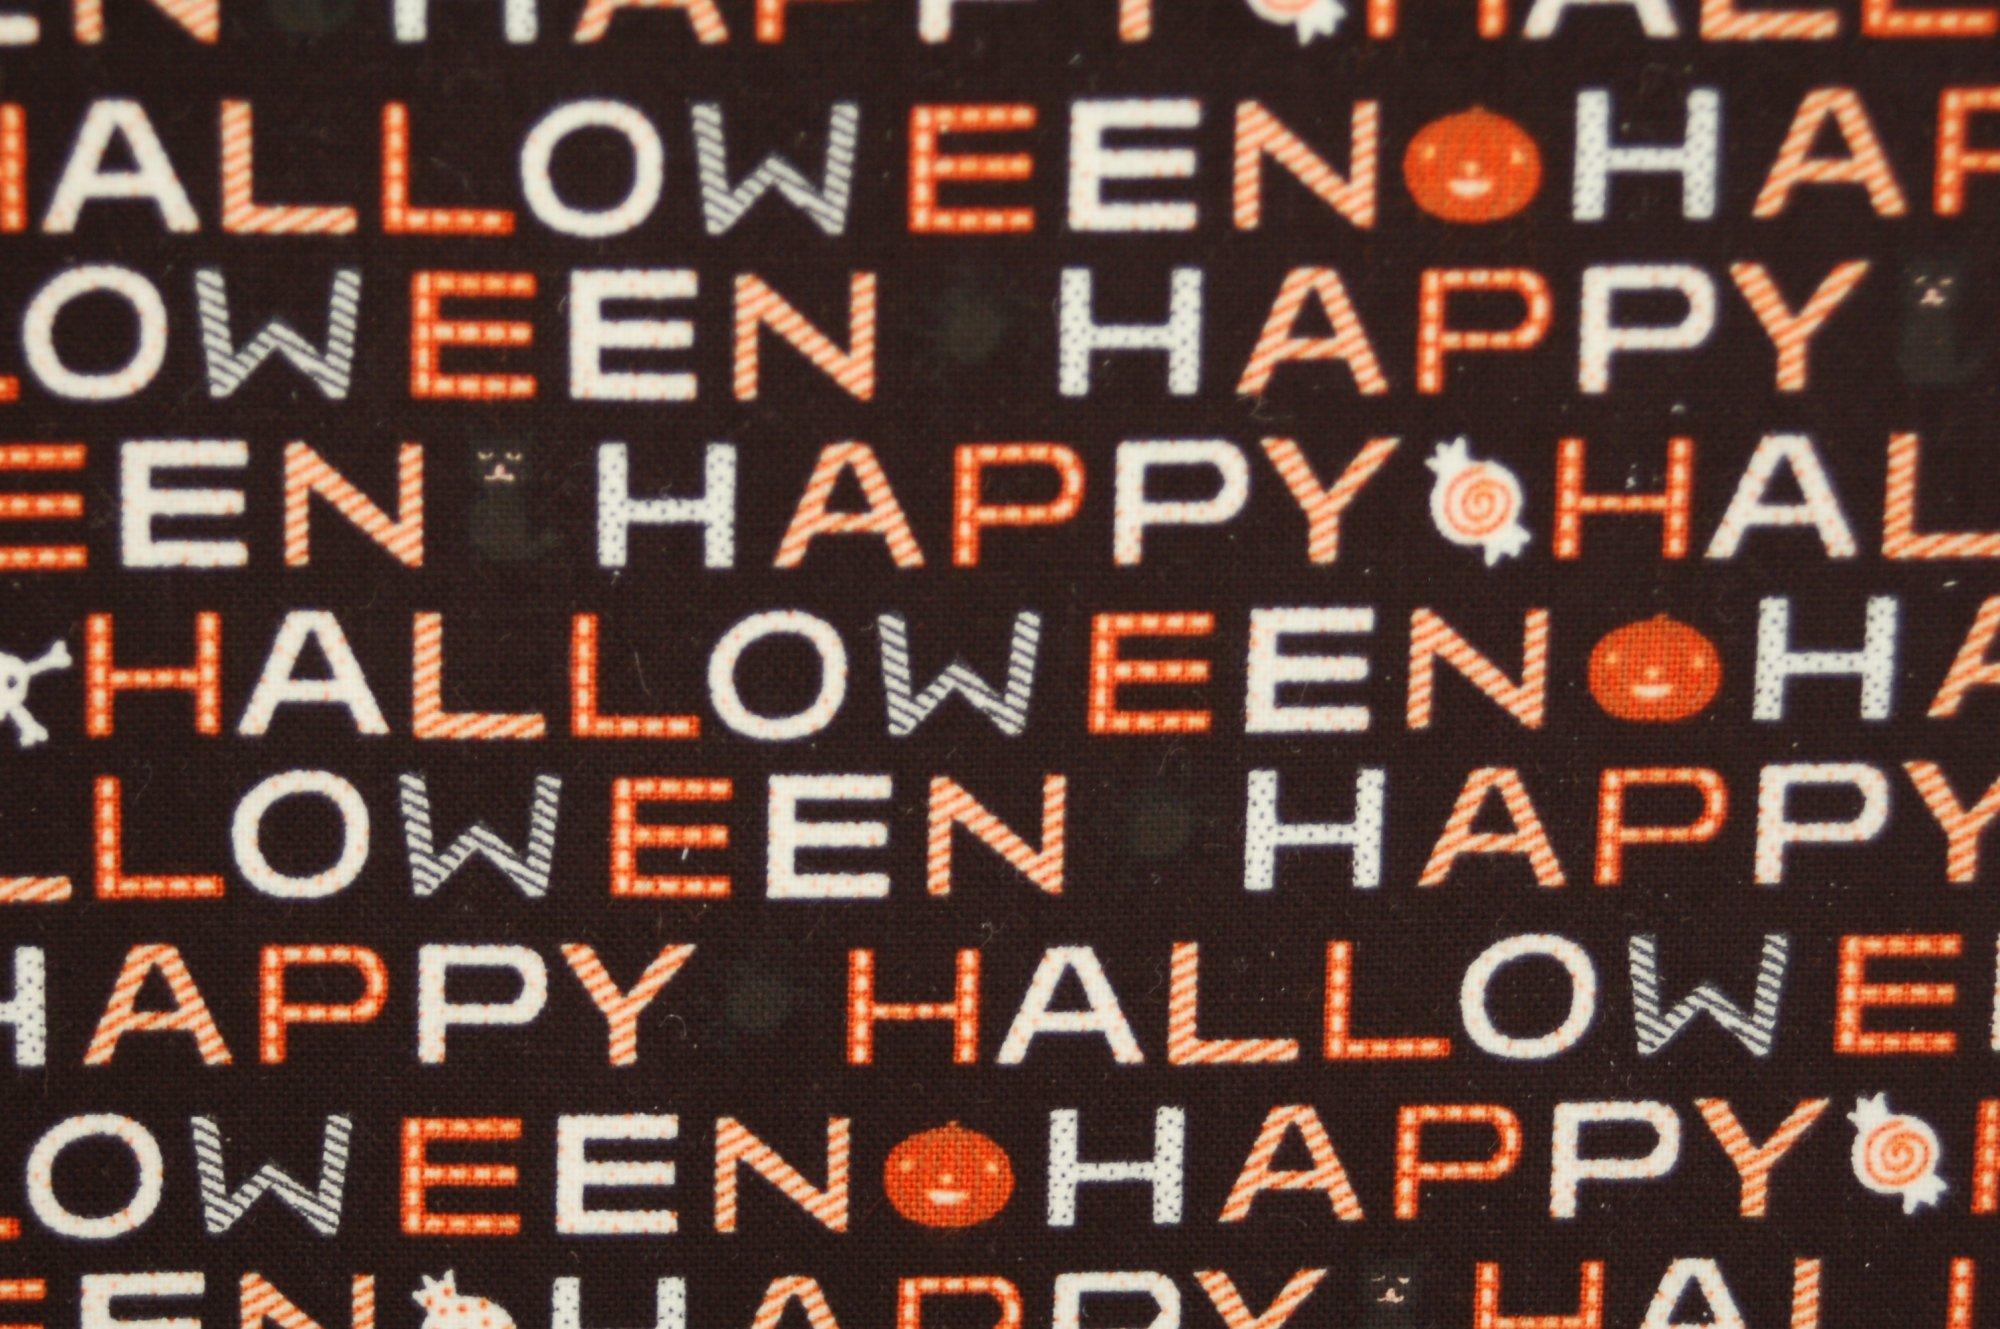 Cats, Bats and Jacks Happy Halloween by Riley Blake